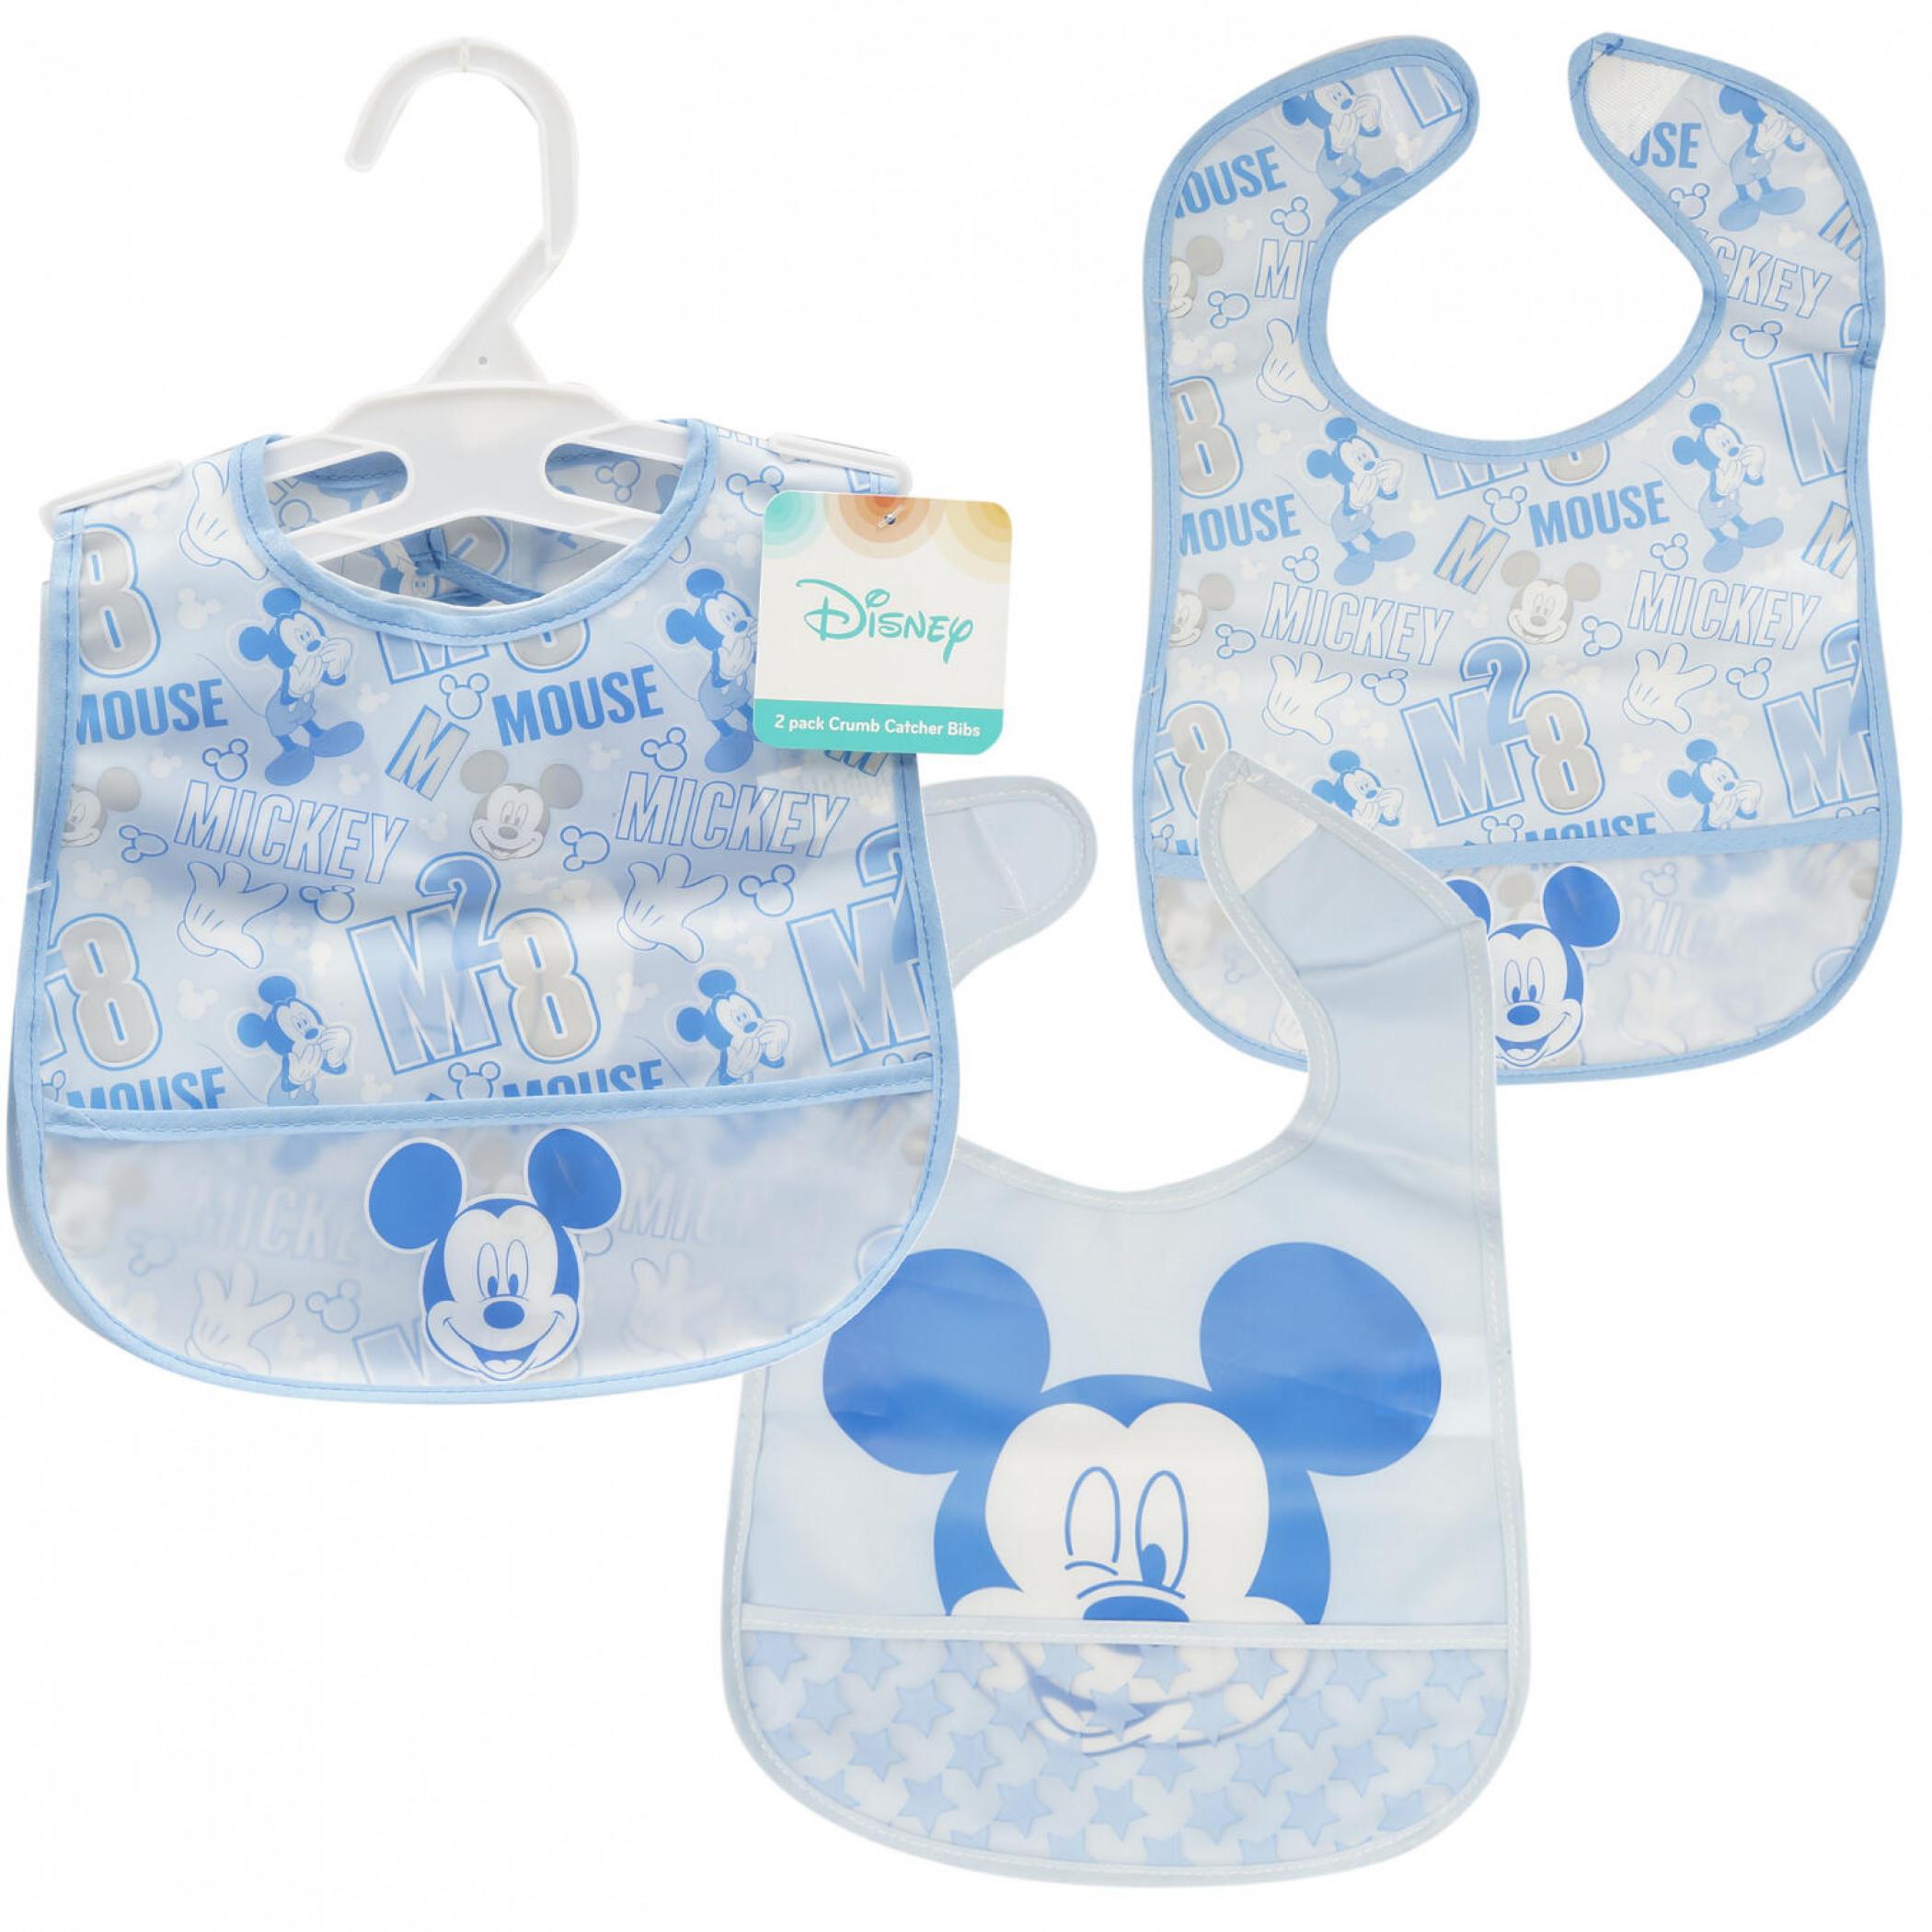 Disney Mickey Mouse Crumb Catcher Bib 2-Pack